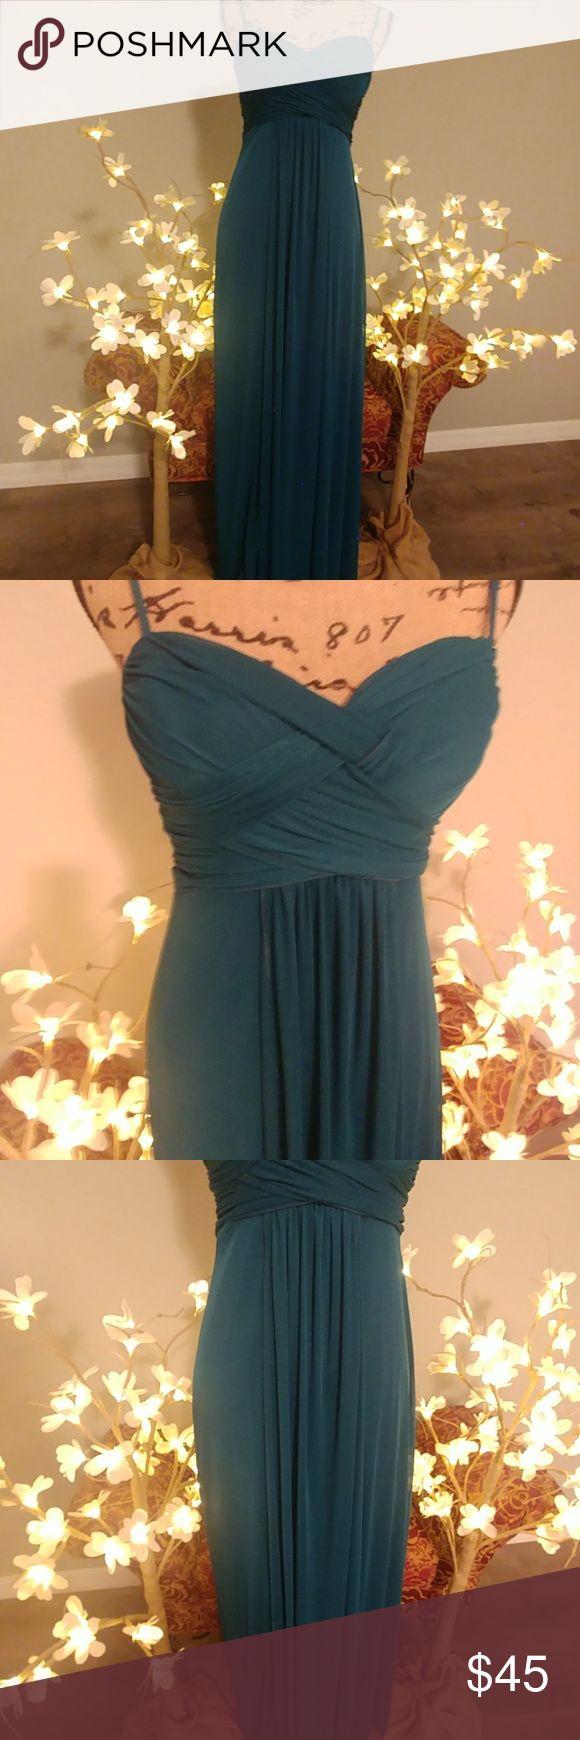 Wunderschönes türkisfarbenes Kleid Wunderschönes türkisfarbenes Kleid mit Kreuzakzent aus …